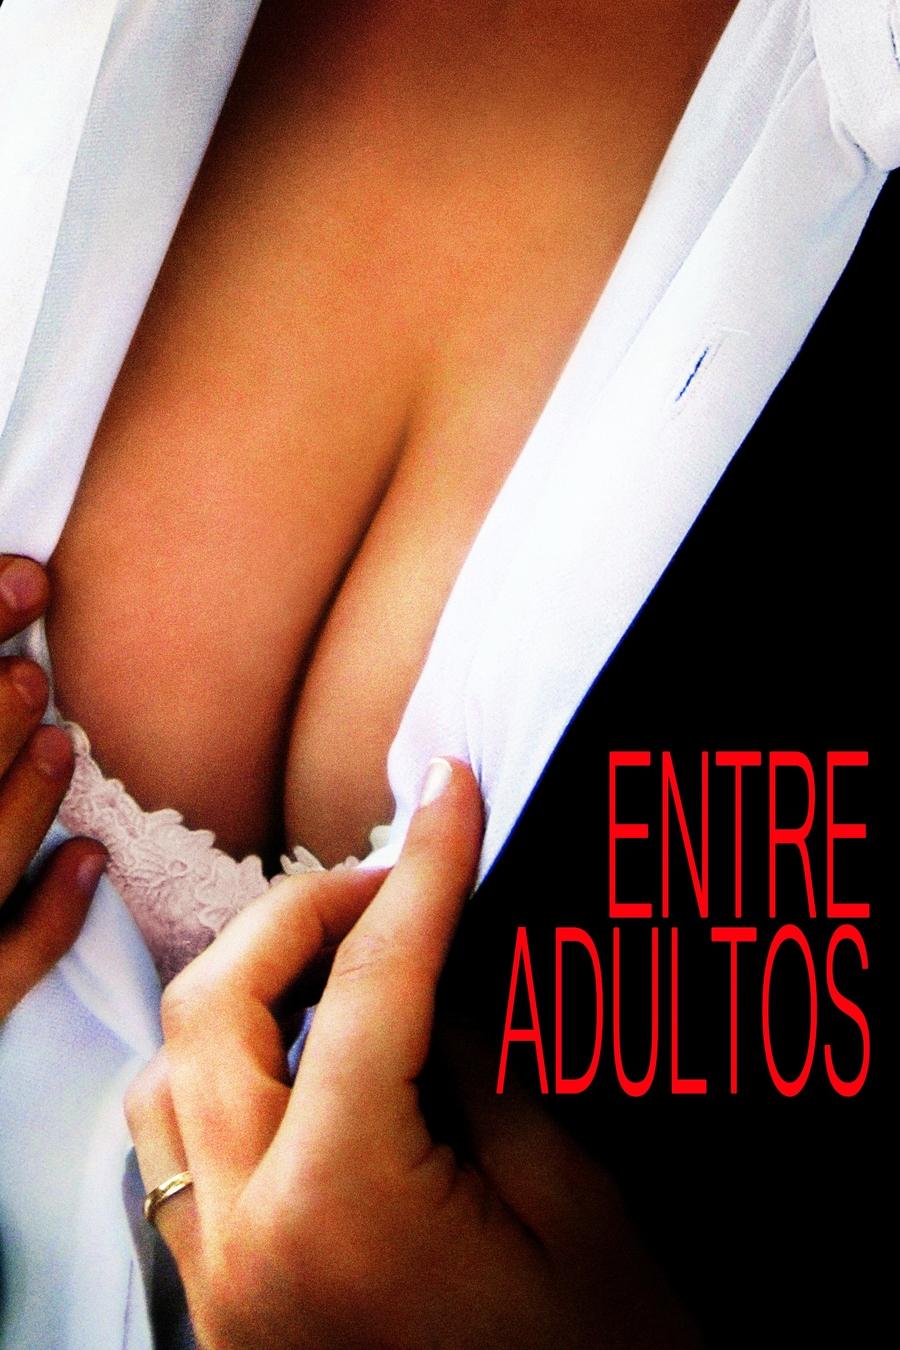 Entre adultos